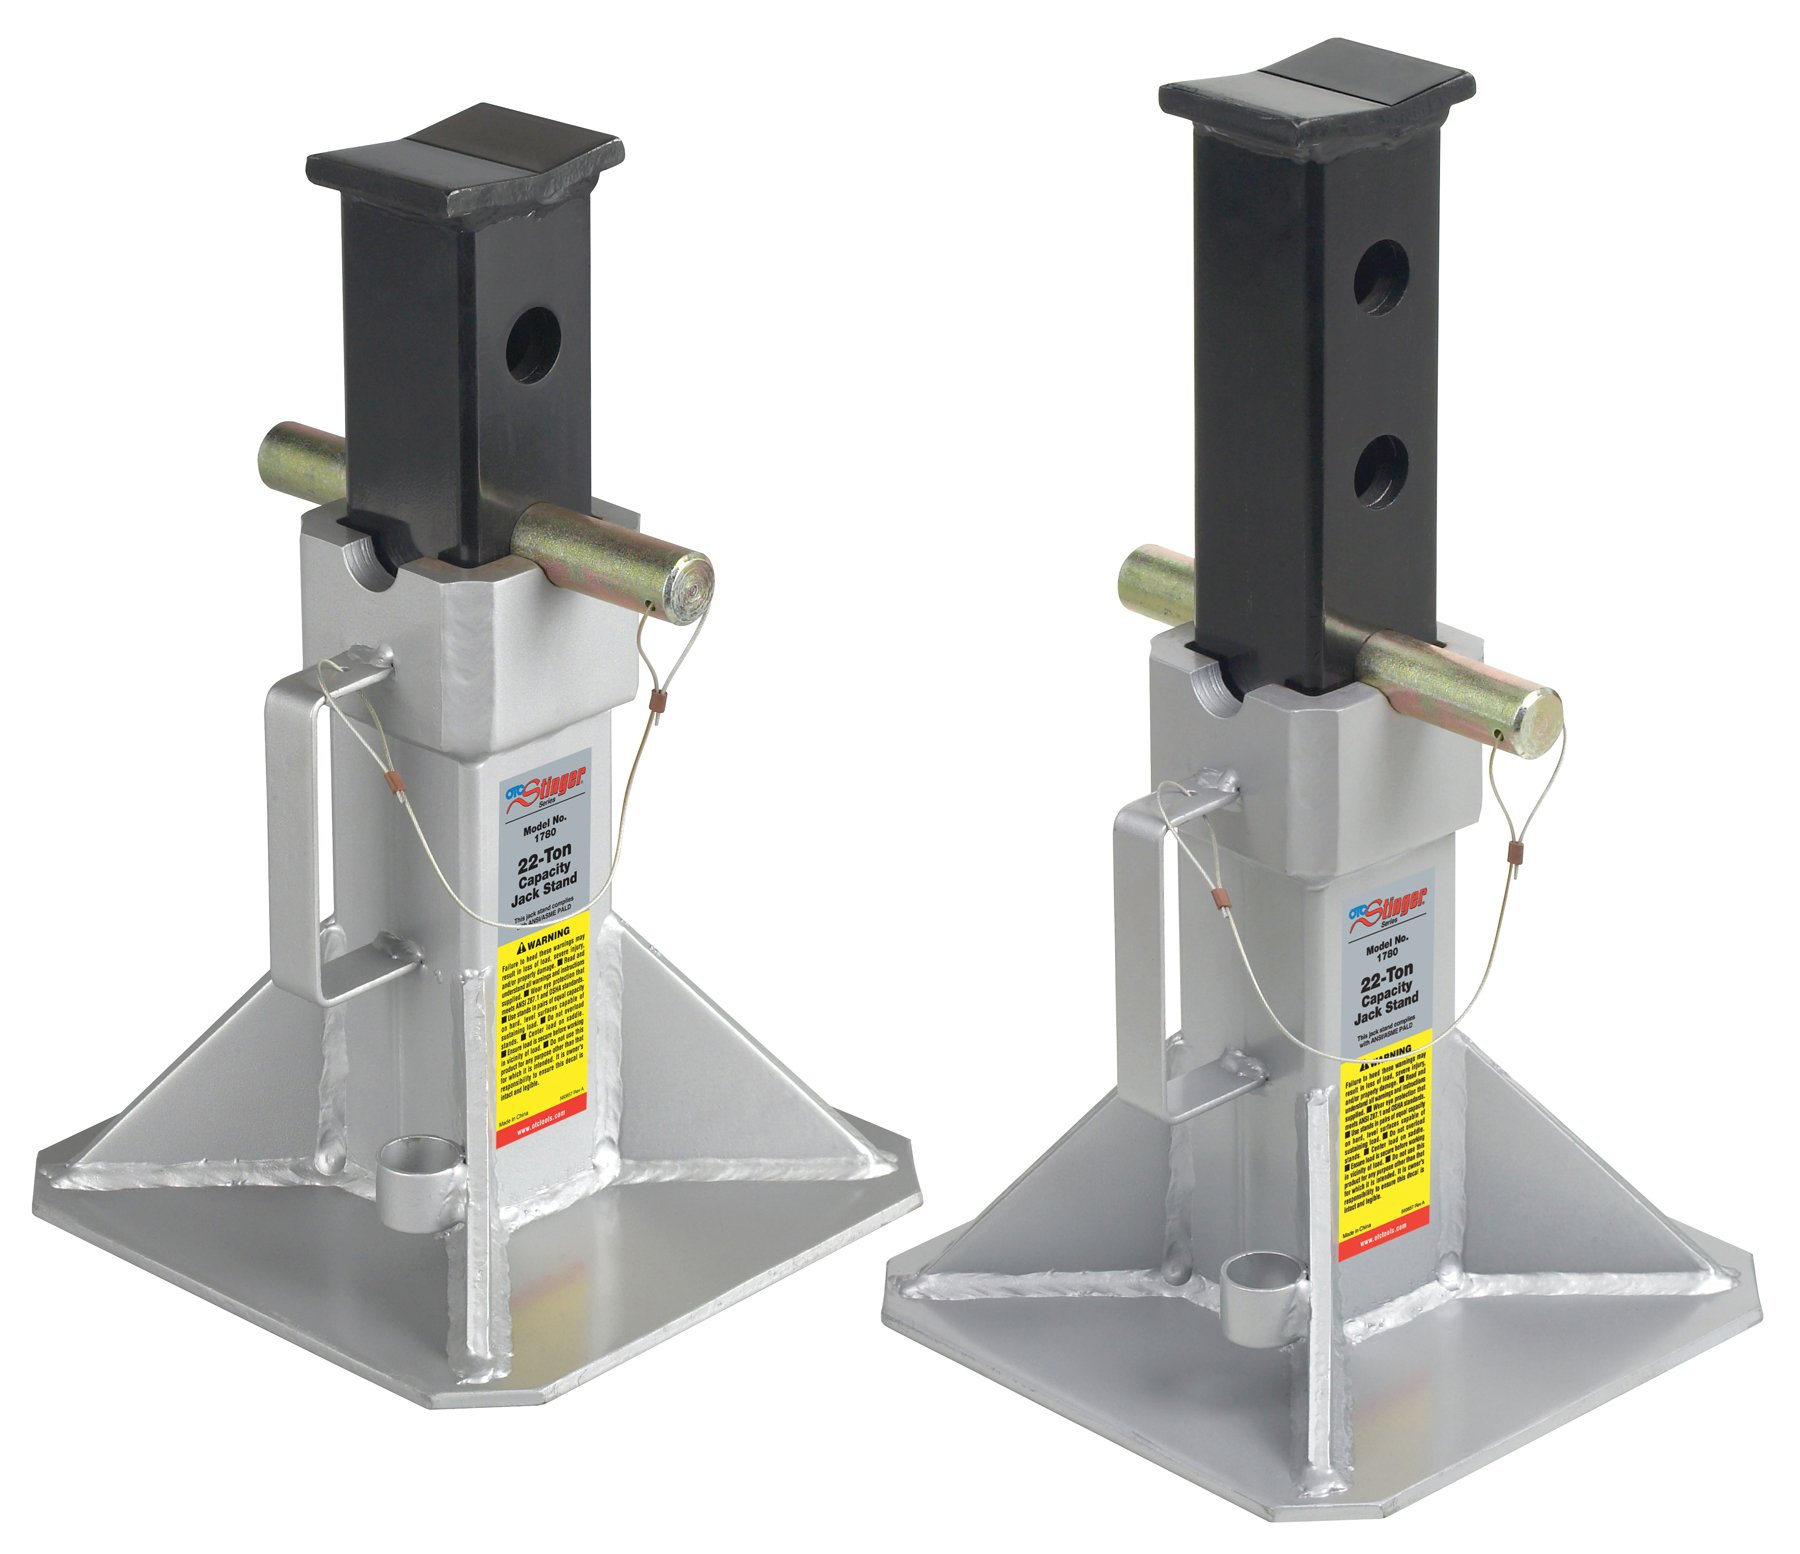 OTC 1780 Jack Stand - 1 Pair product image